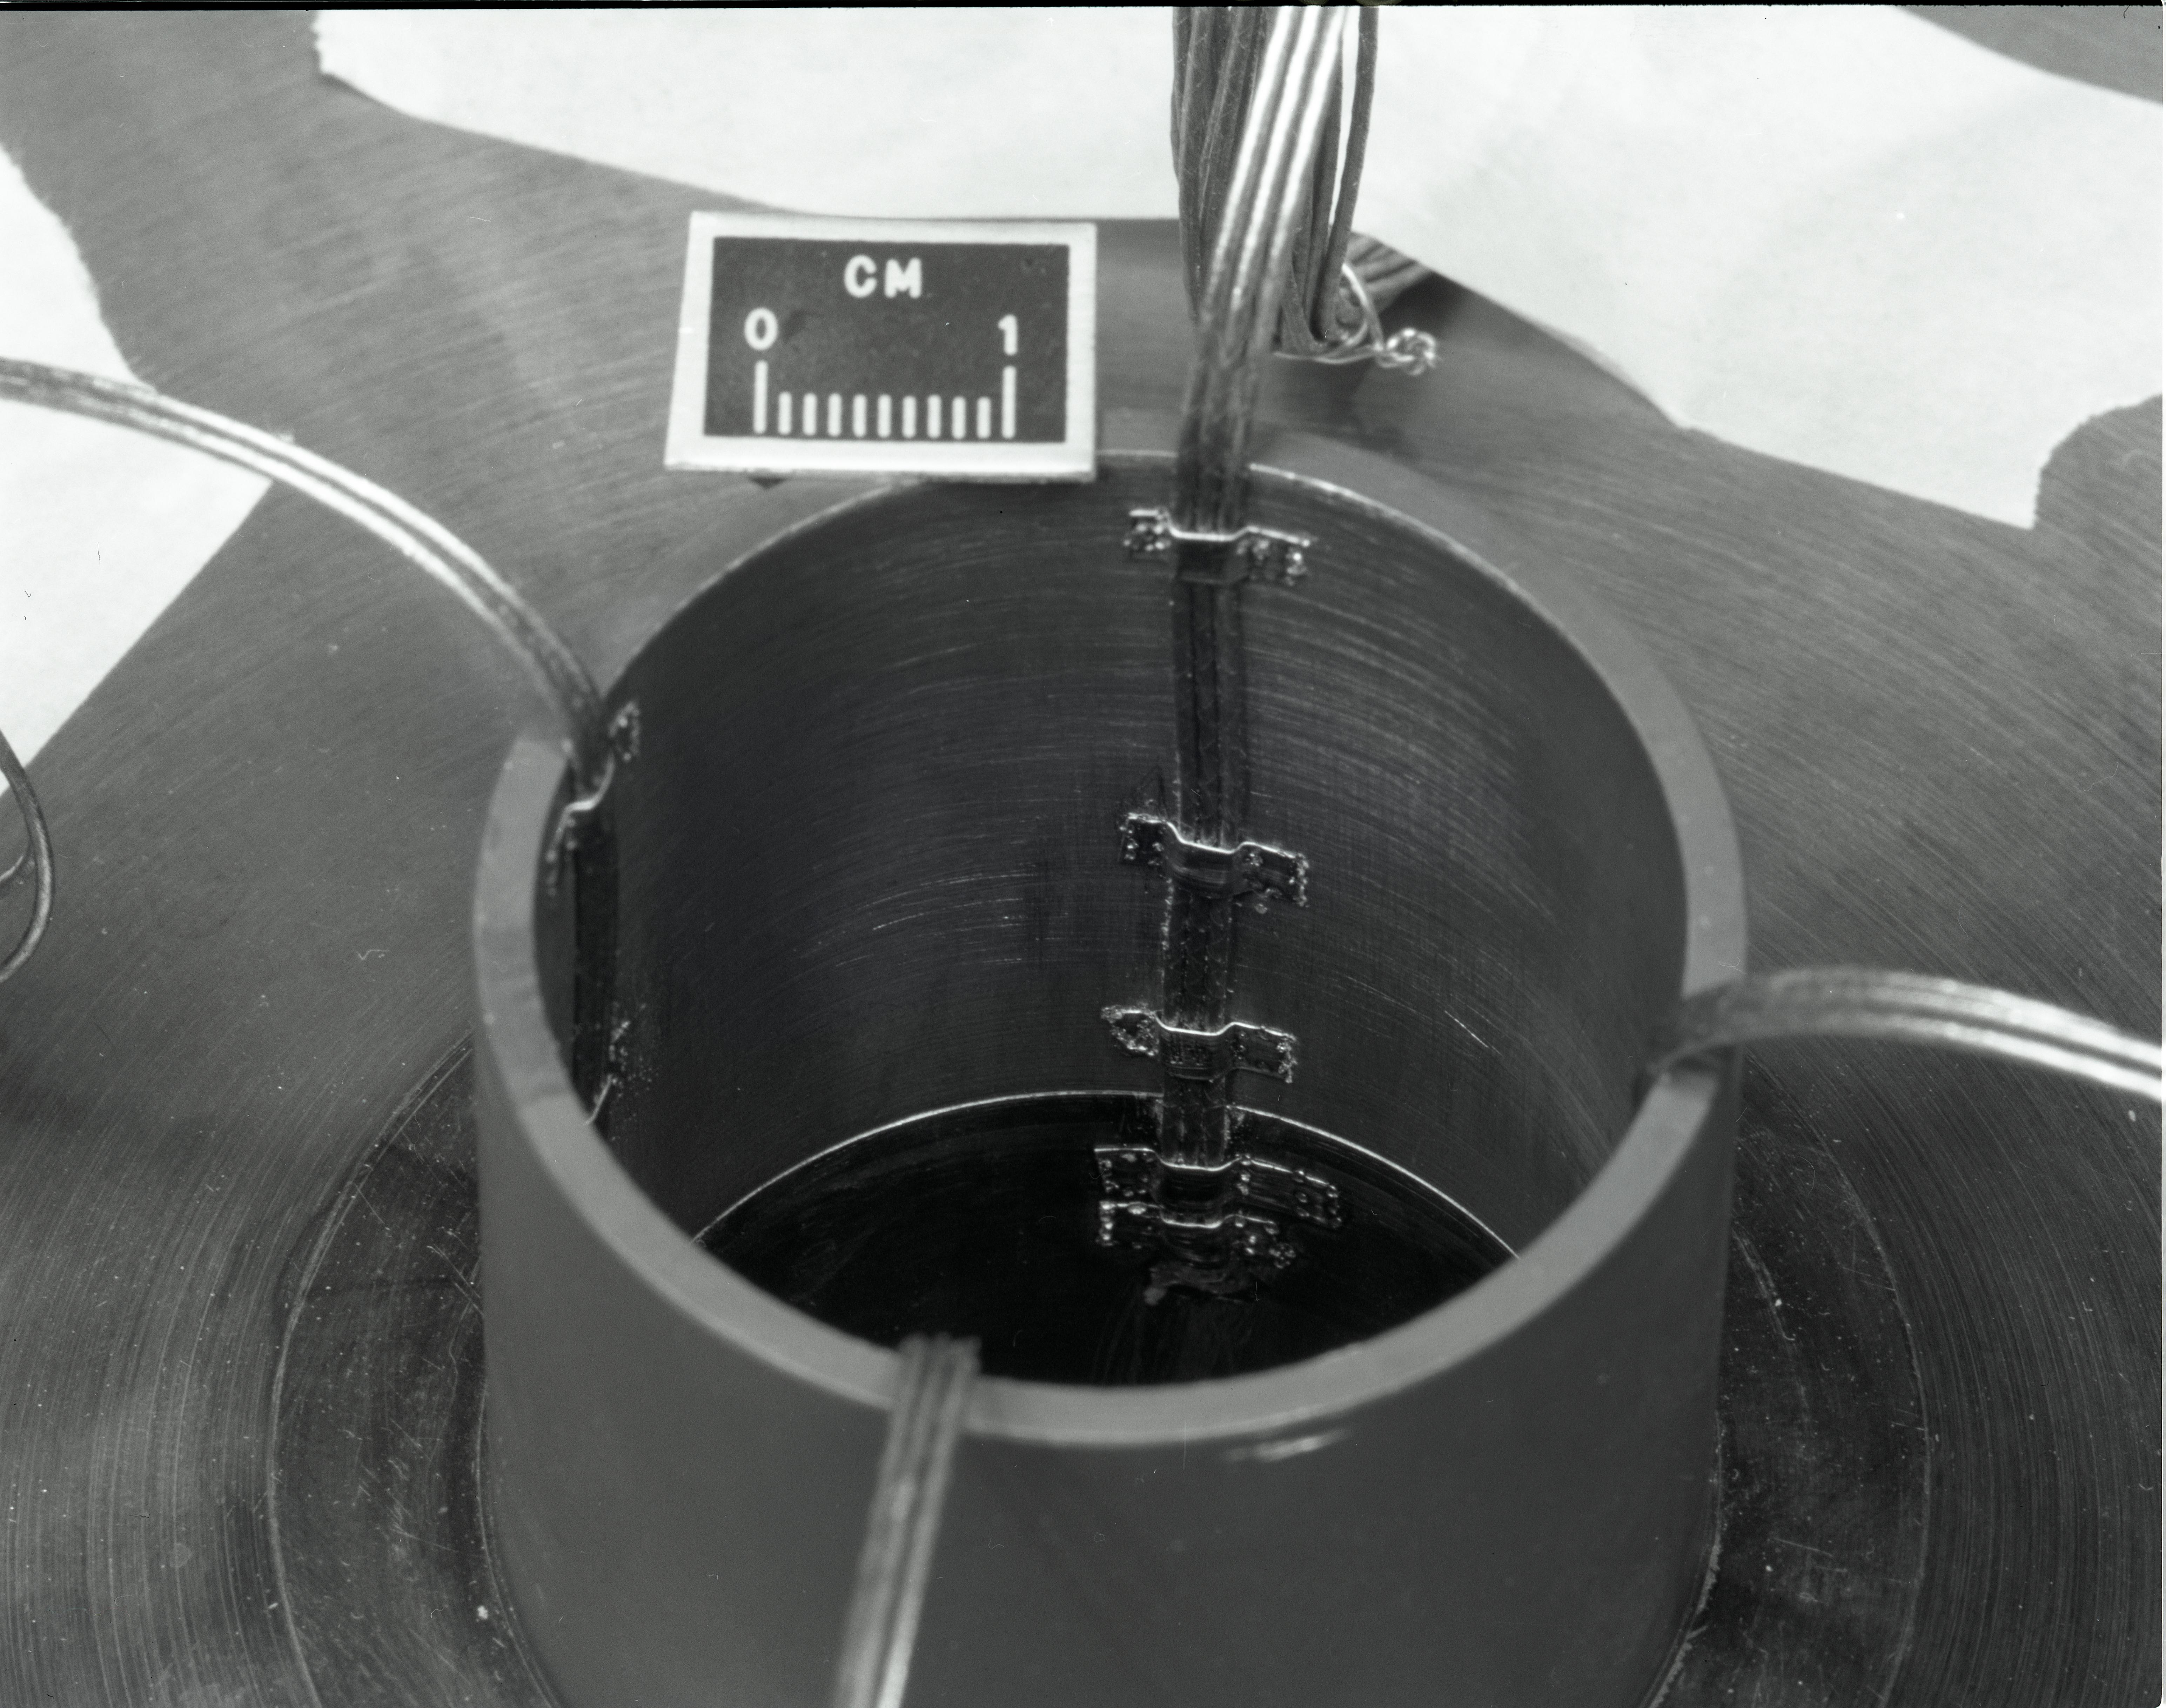 Omnia Strain Gauge Wiring Of Compressor Rotor